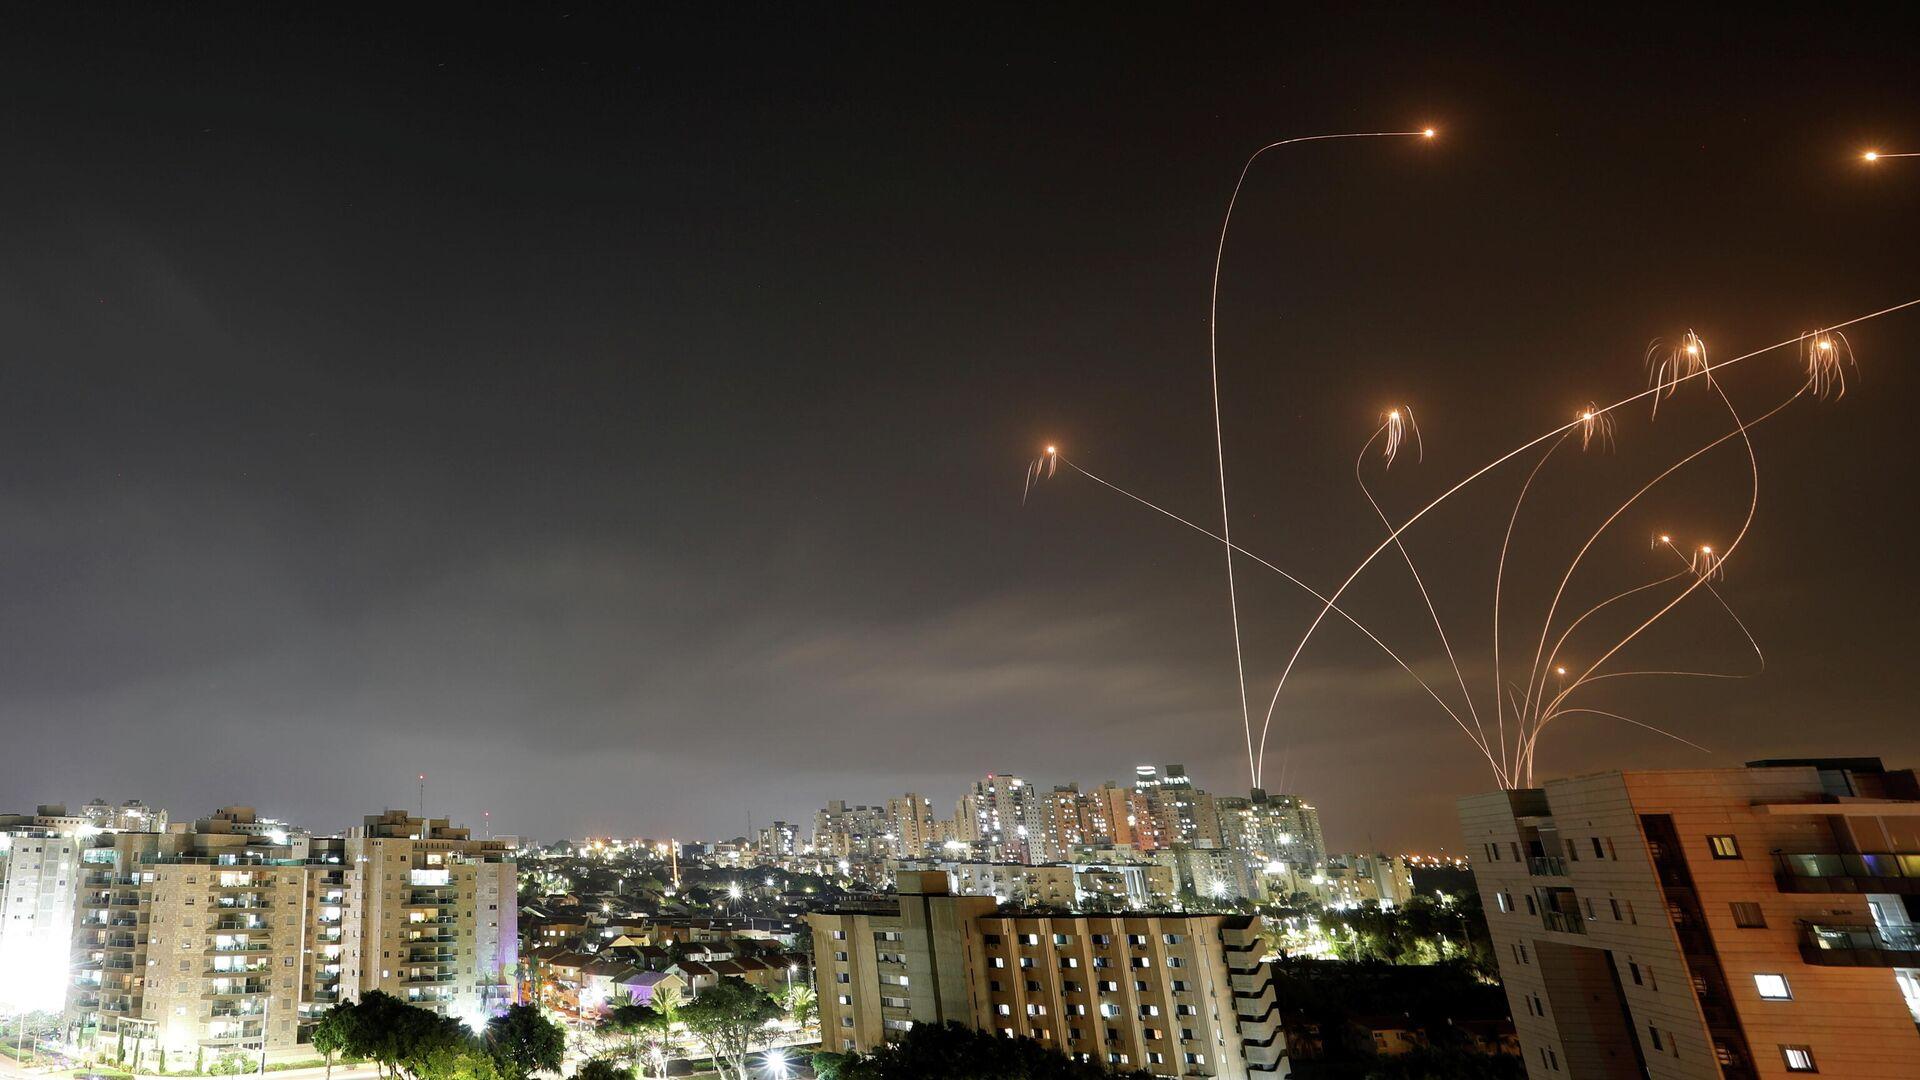 La Cúpula de Hierro israelí intercepta misiles lanzados desde Gaza - Sputnik Mundo, 1920, 23.05.2021